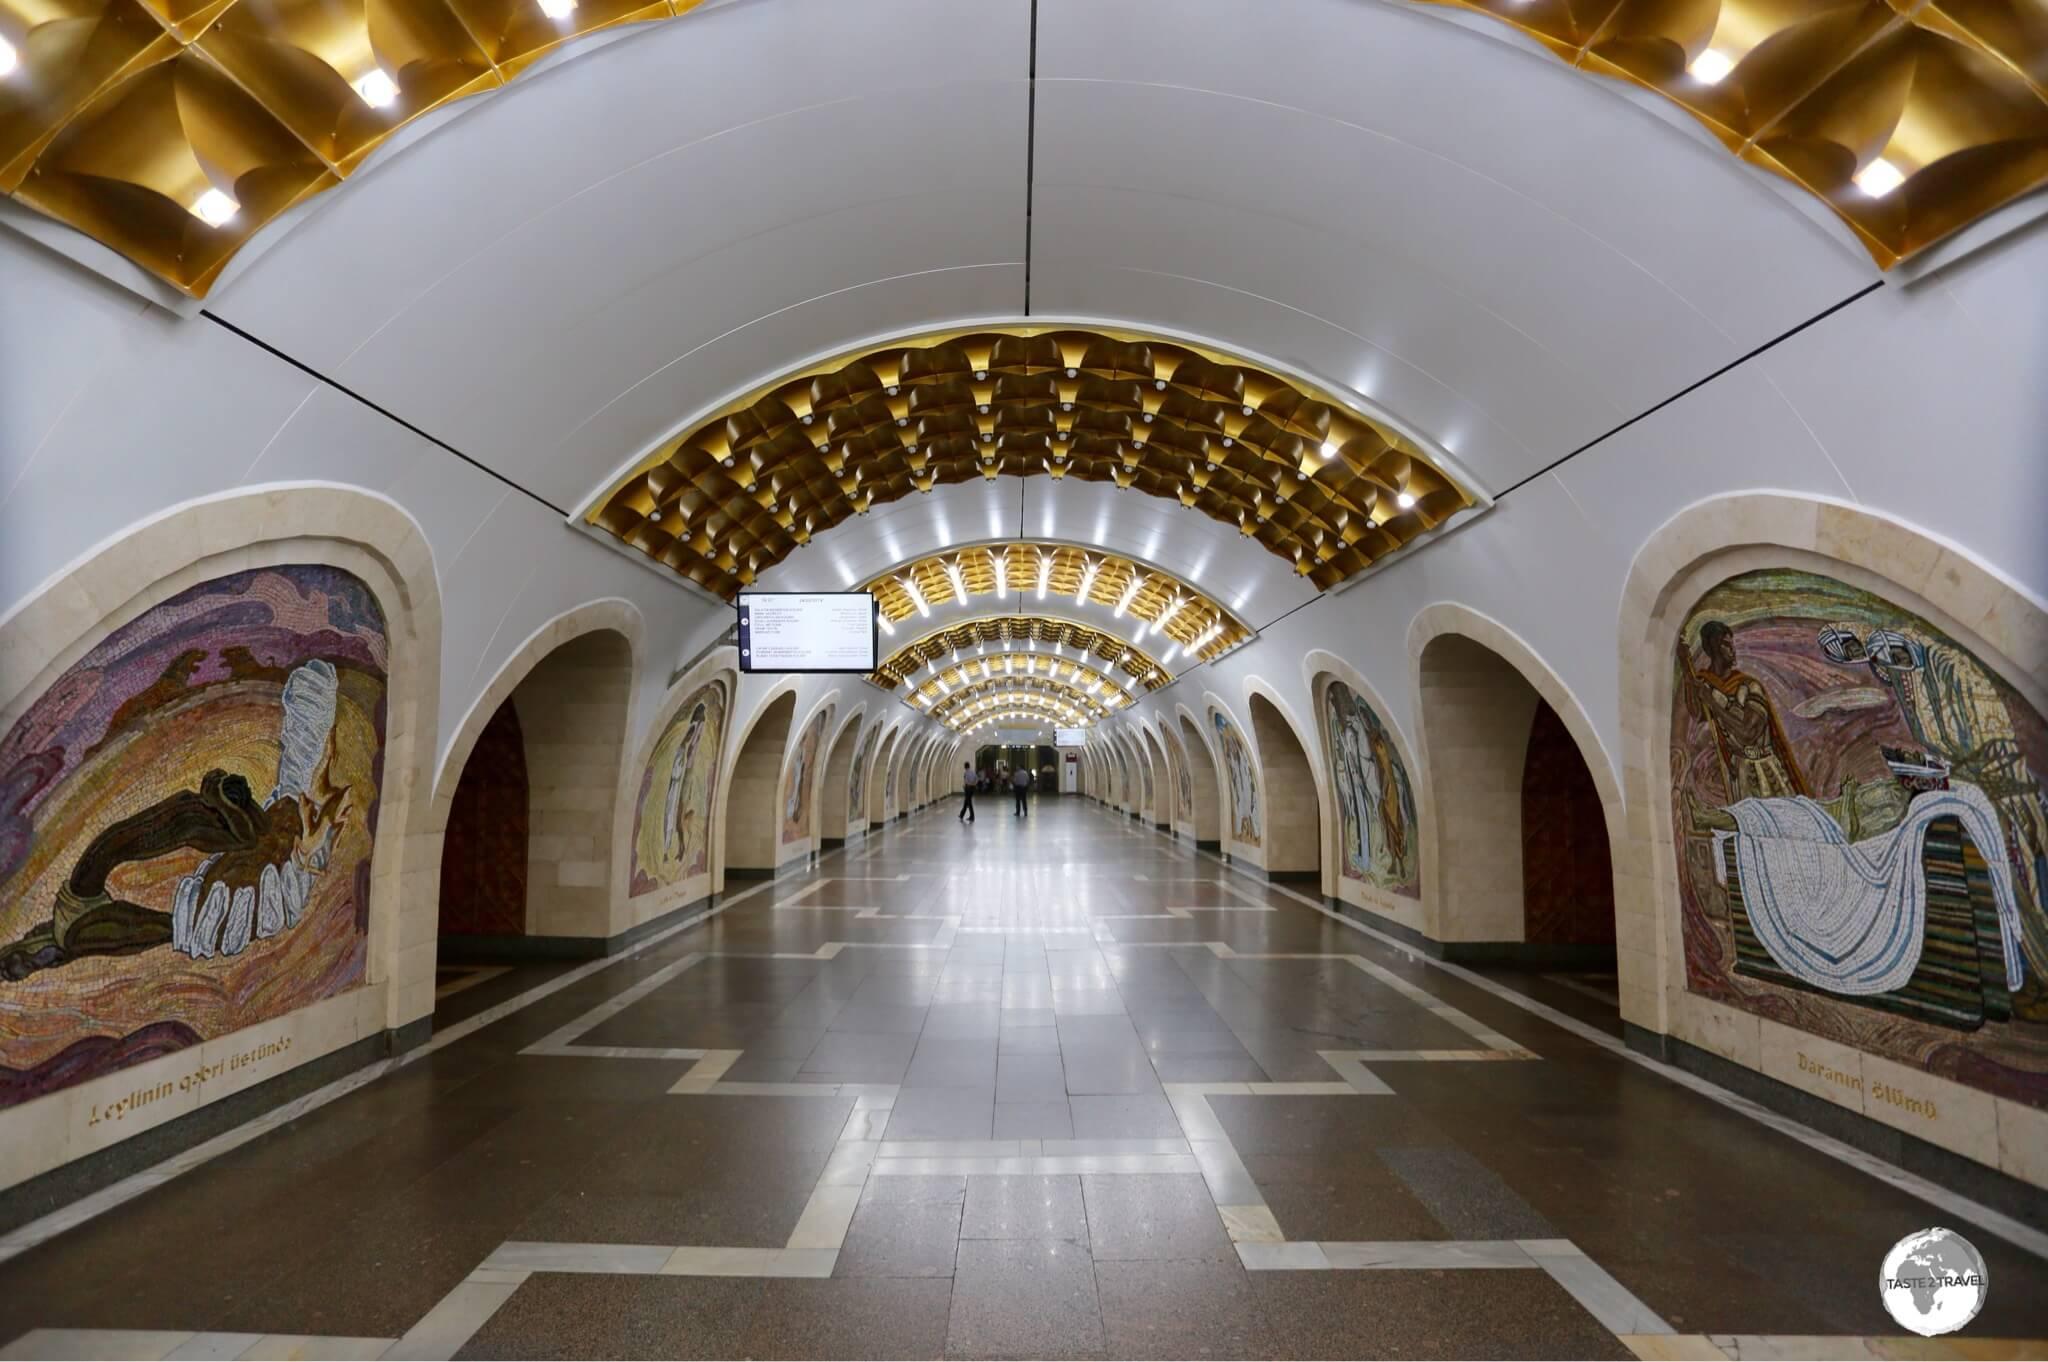 Tile mosaics line the walls of Nizami Metro Station.